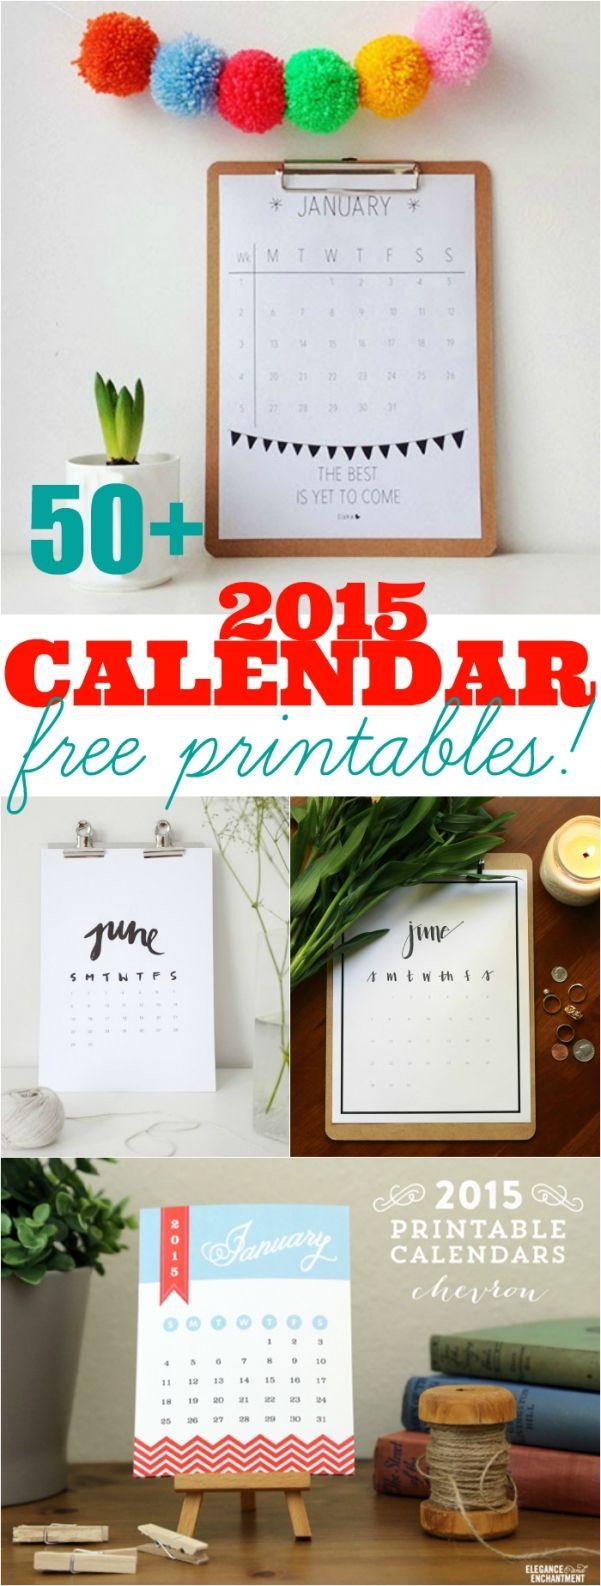 Meer dan 50 + AWESOME 2015 gratis printbare kalenders !!  Je